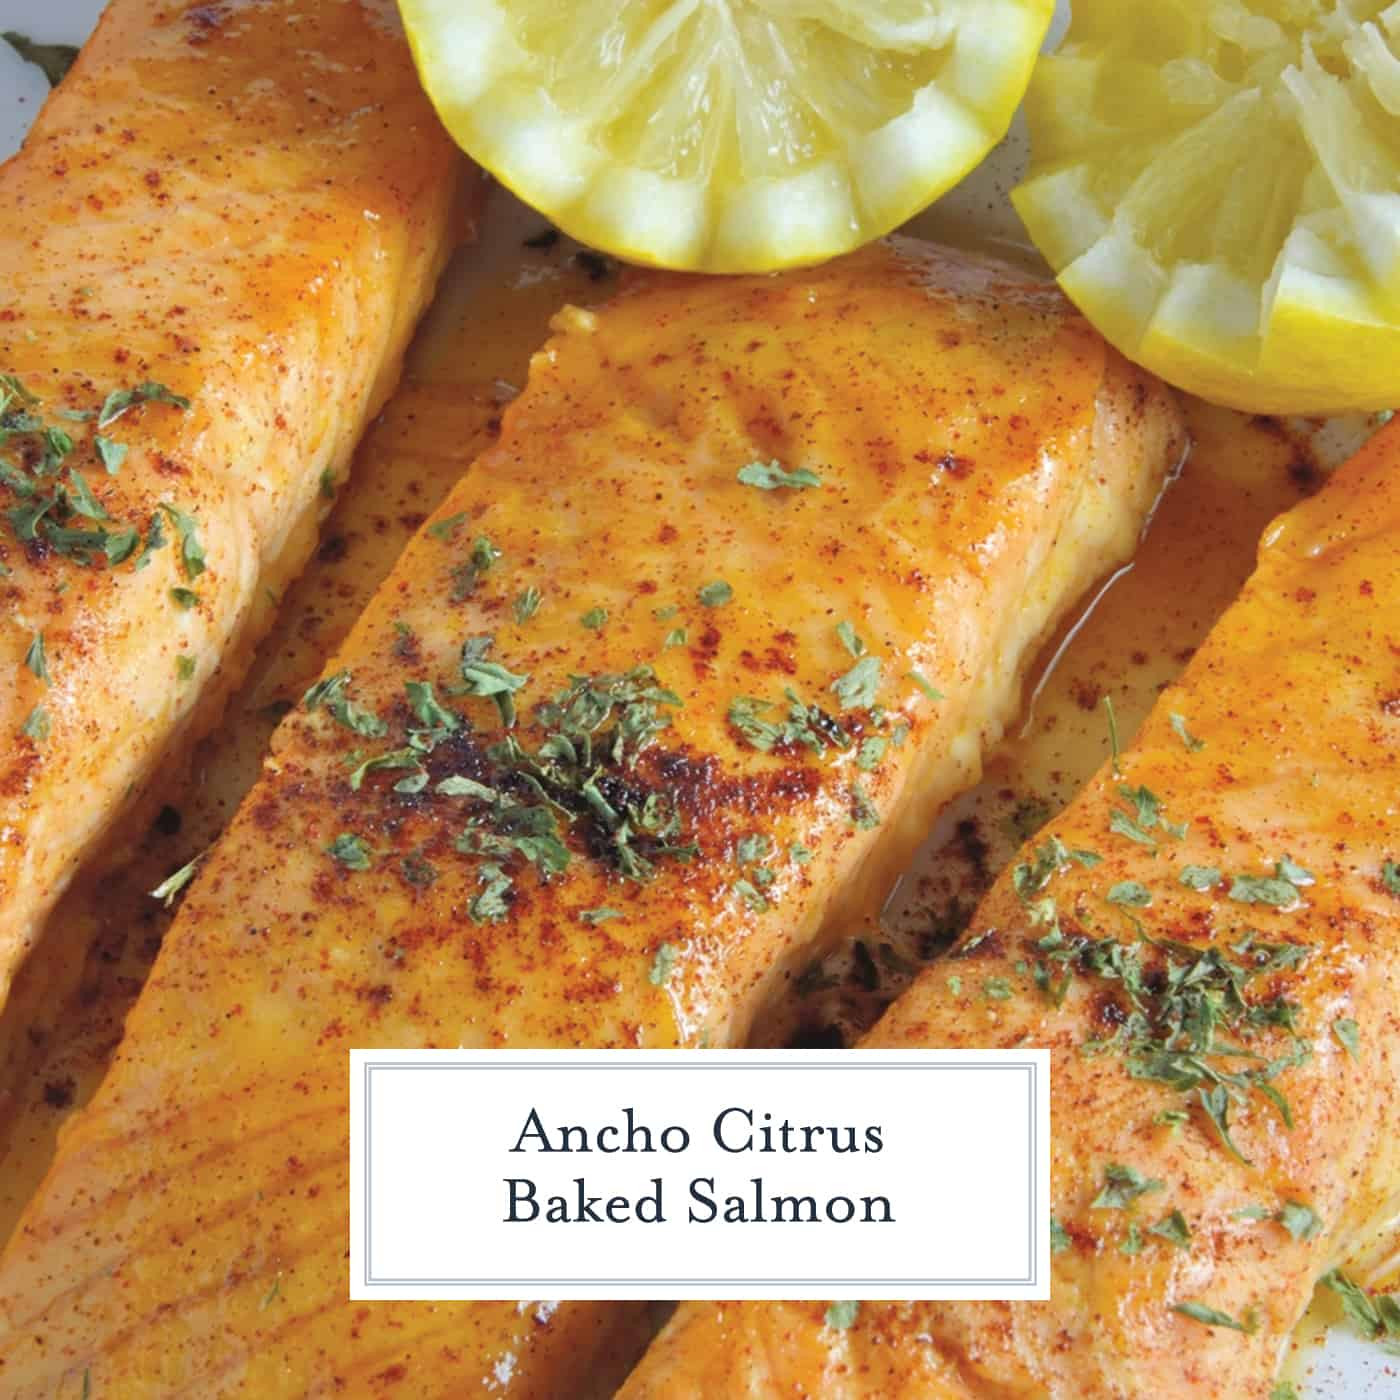 Low Cholesterol Salmon Recipes  Ancho Citrus Baked Salmon Delightfully Easy Salmon Recipe